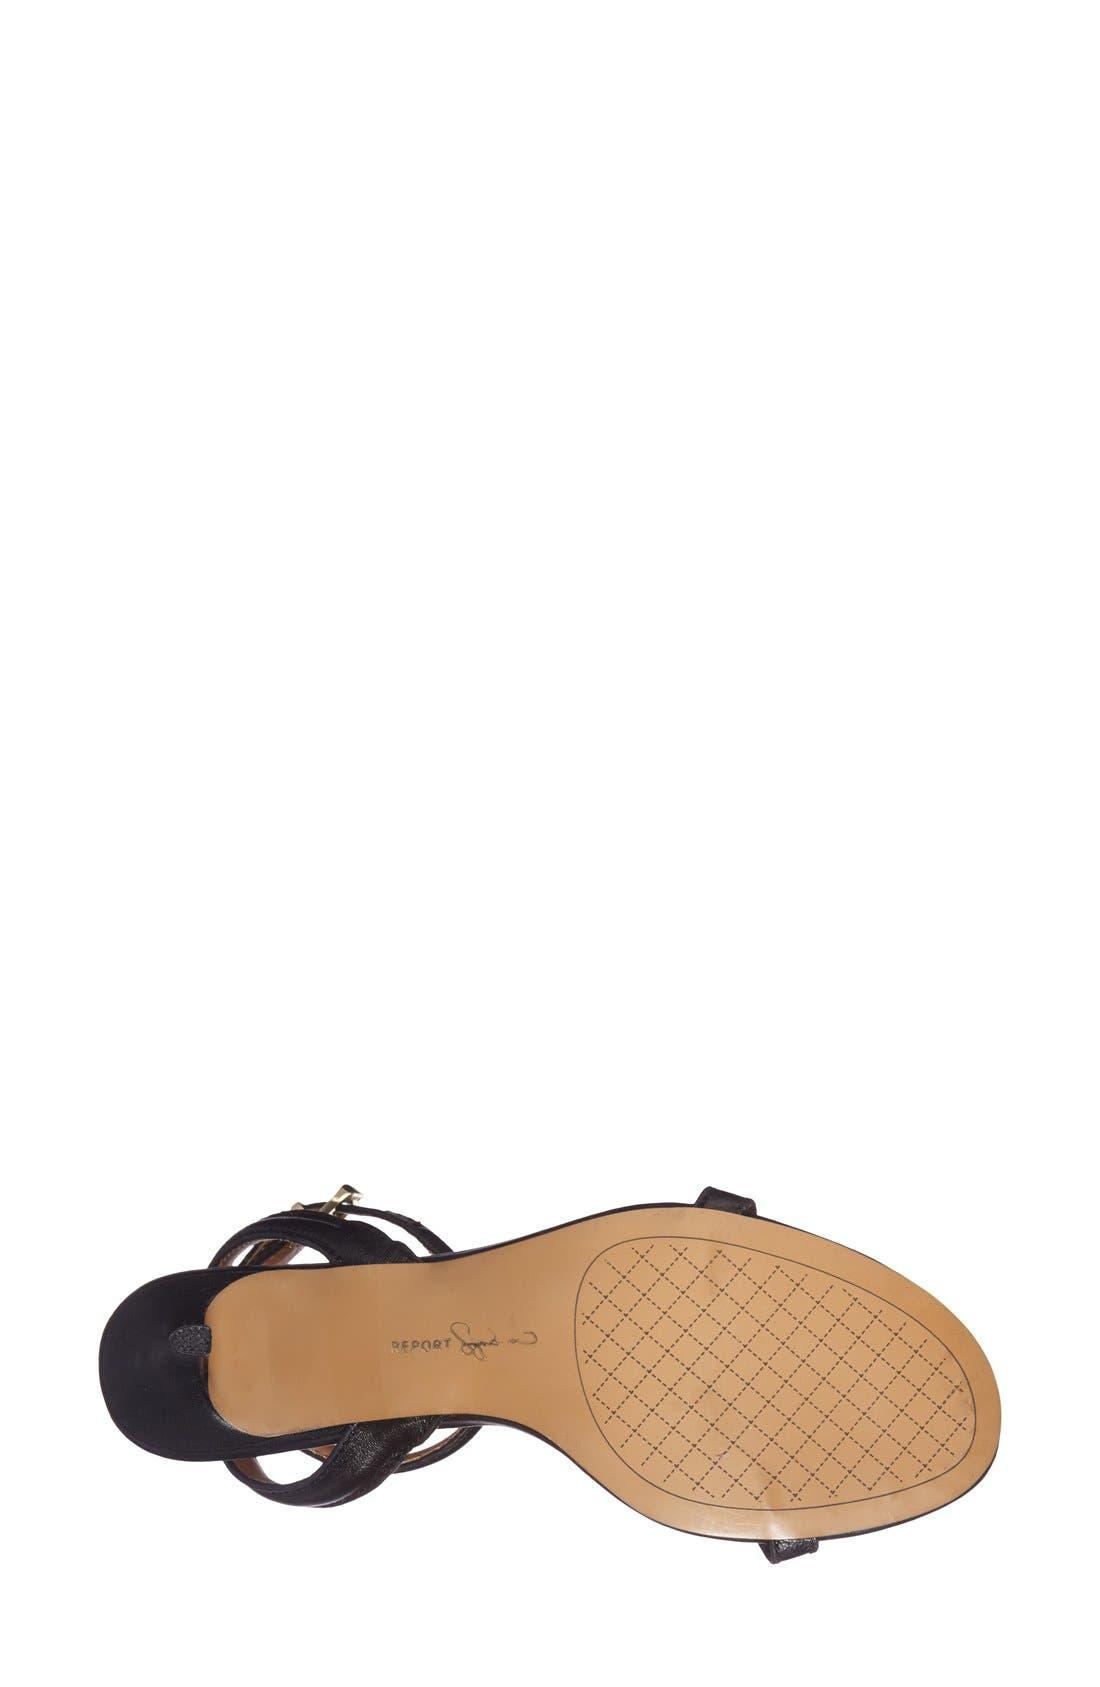 REPORT 'Signature Neely' Ankle Strap Sandal,                             Alternate thumbnail 3, color,                             001